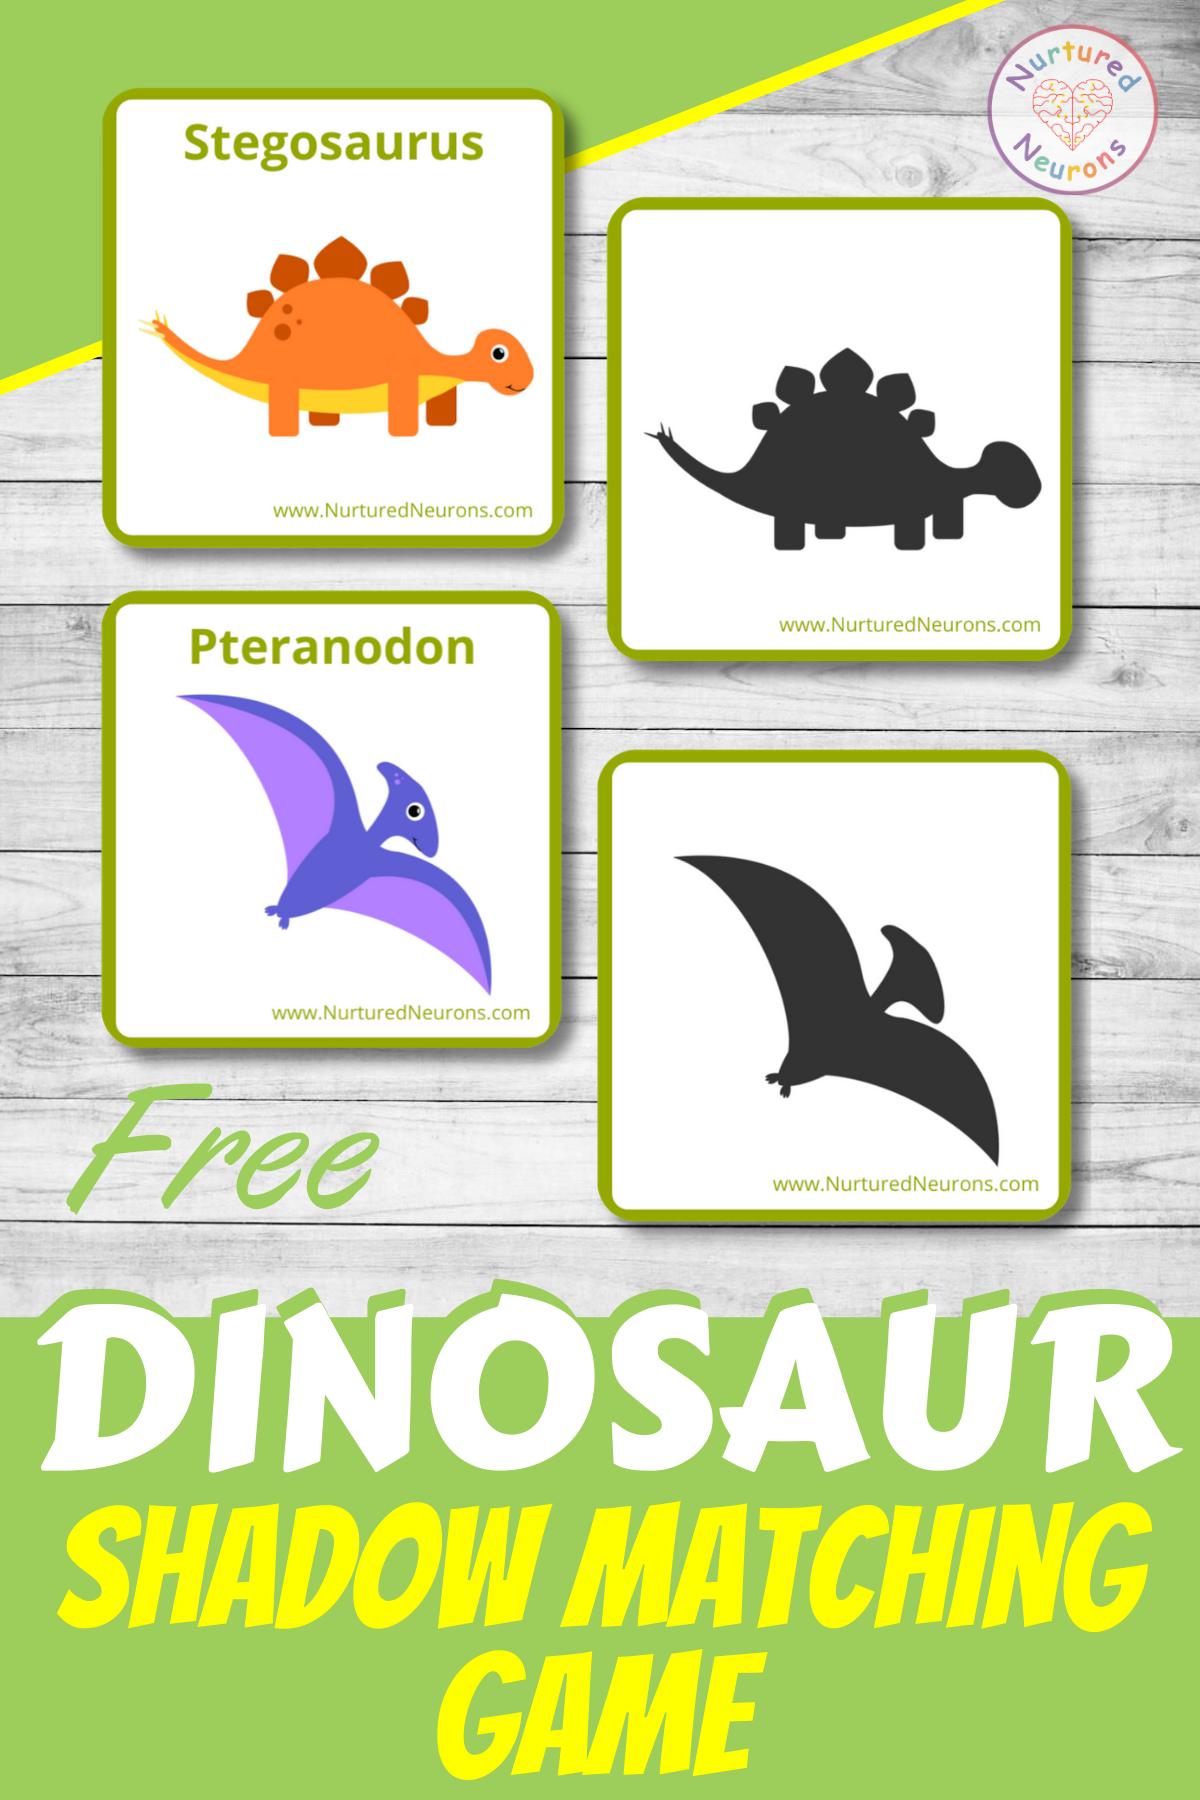 Dinosaur Shadow Matching Game Free Printable